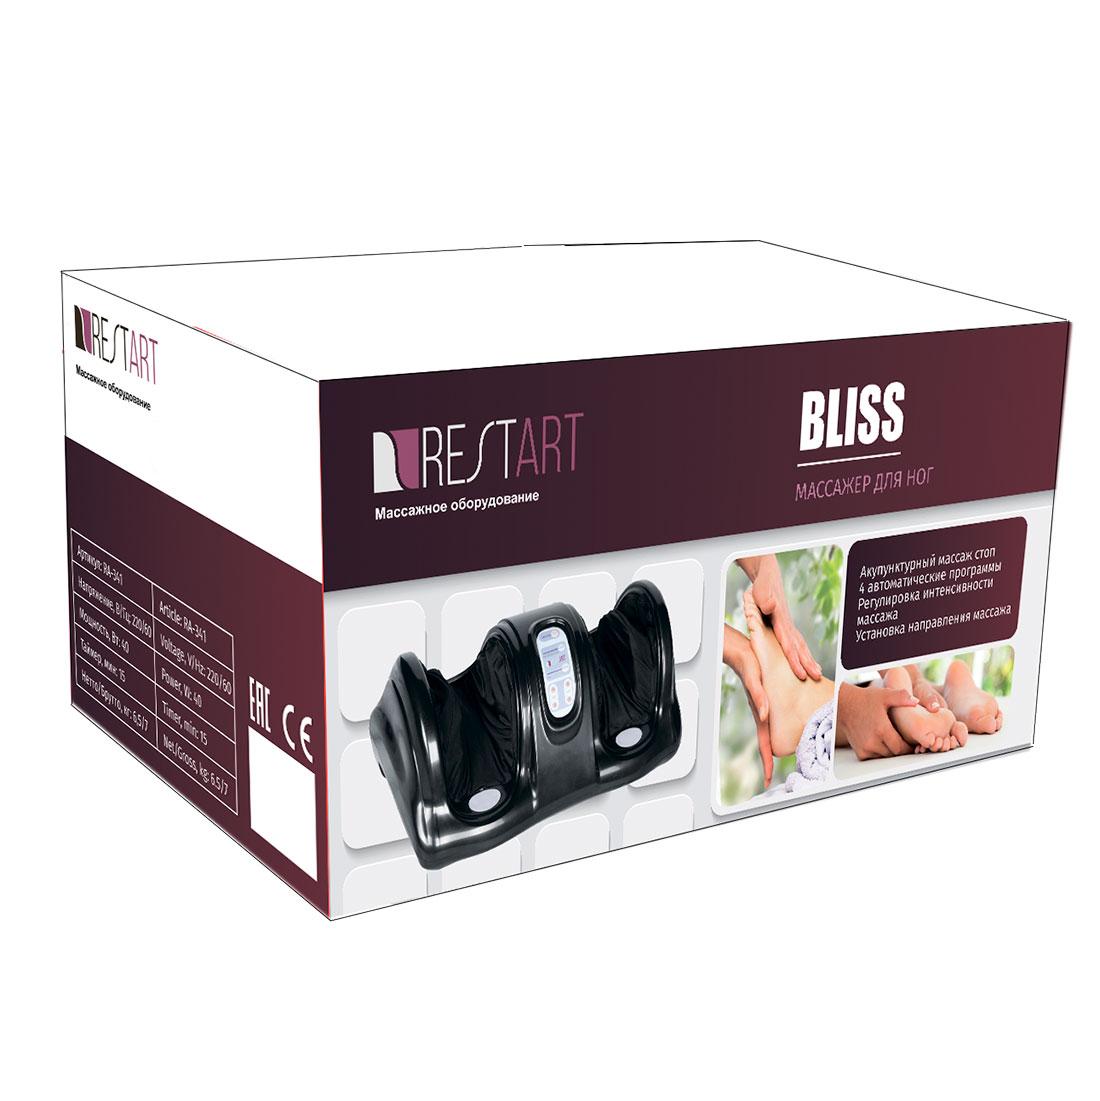 Bliss массажер для ног (красный)